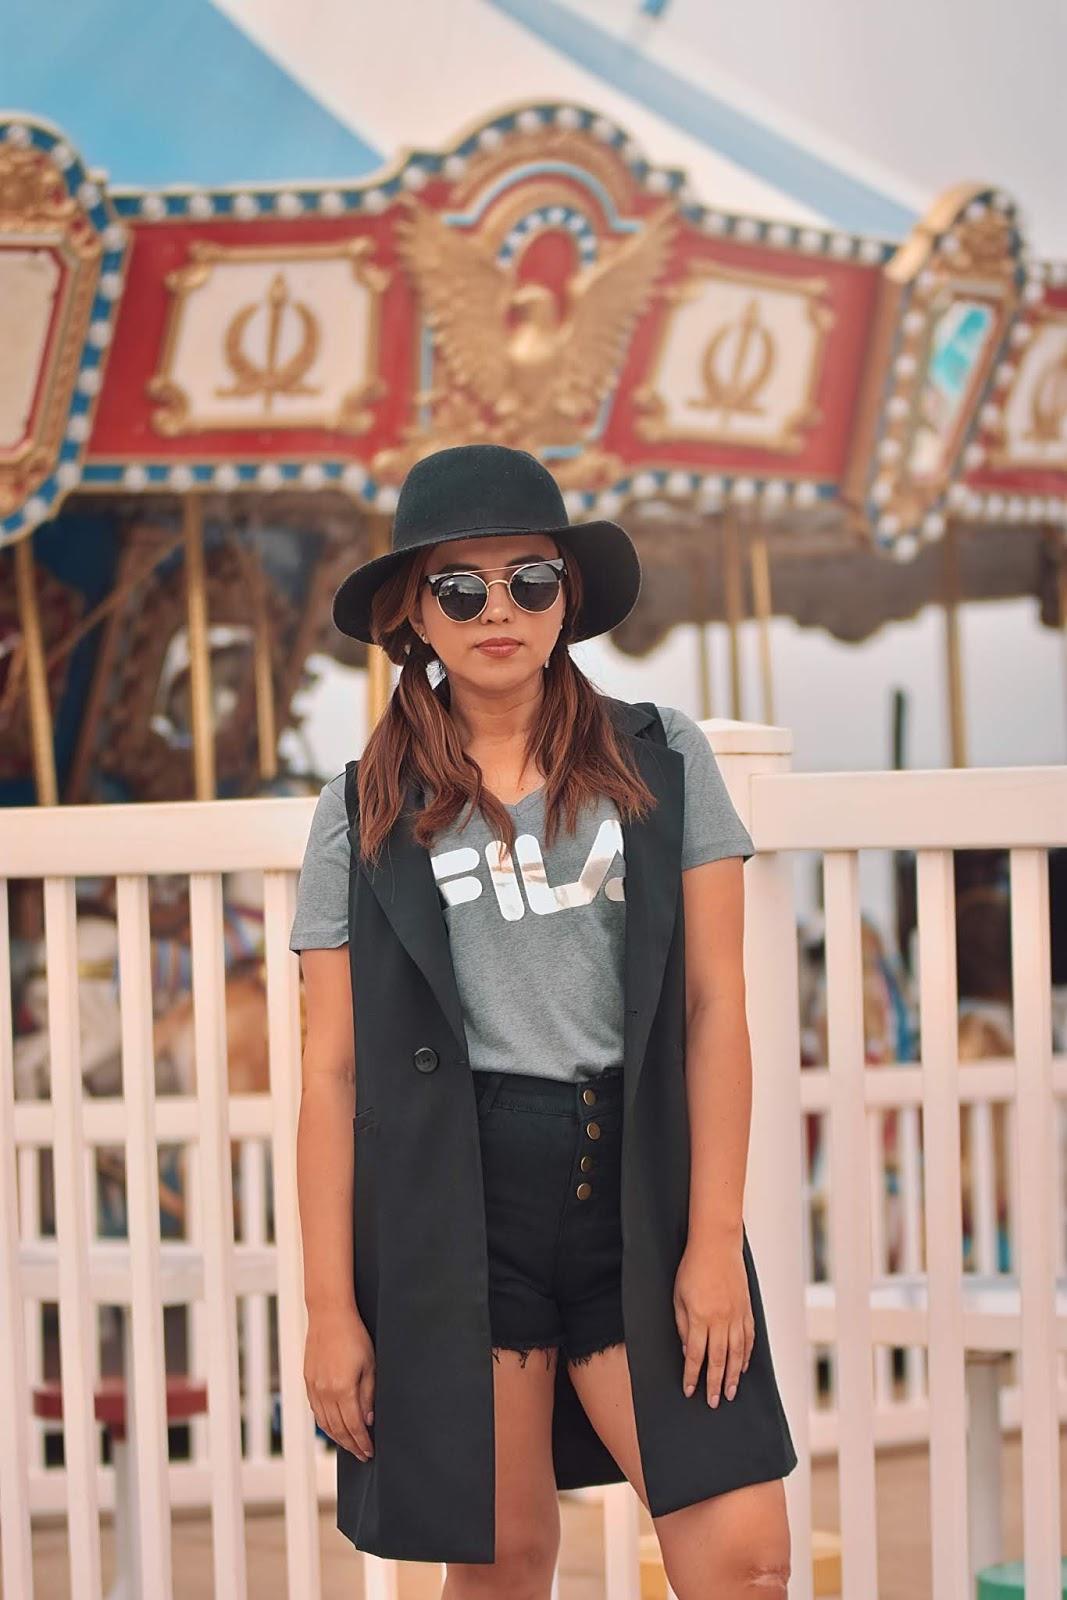 Festival Mood by Mari Estilo -coachella-festival season-sheinfestival-black shorts-desierto-fashionblogger-travel-music festival-